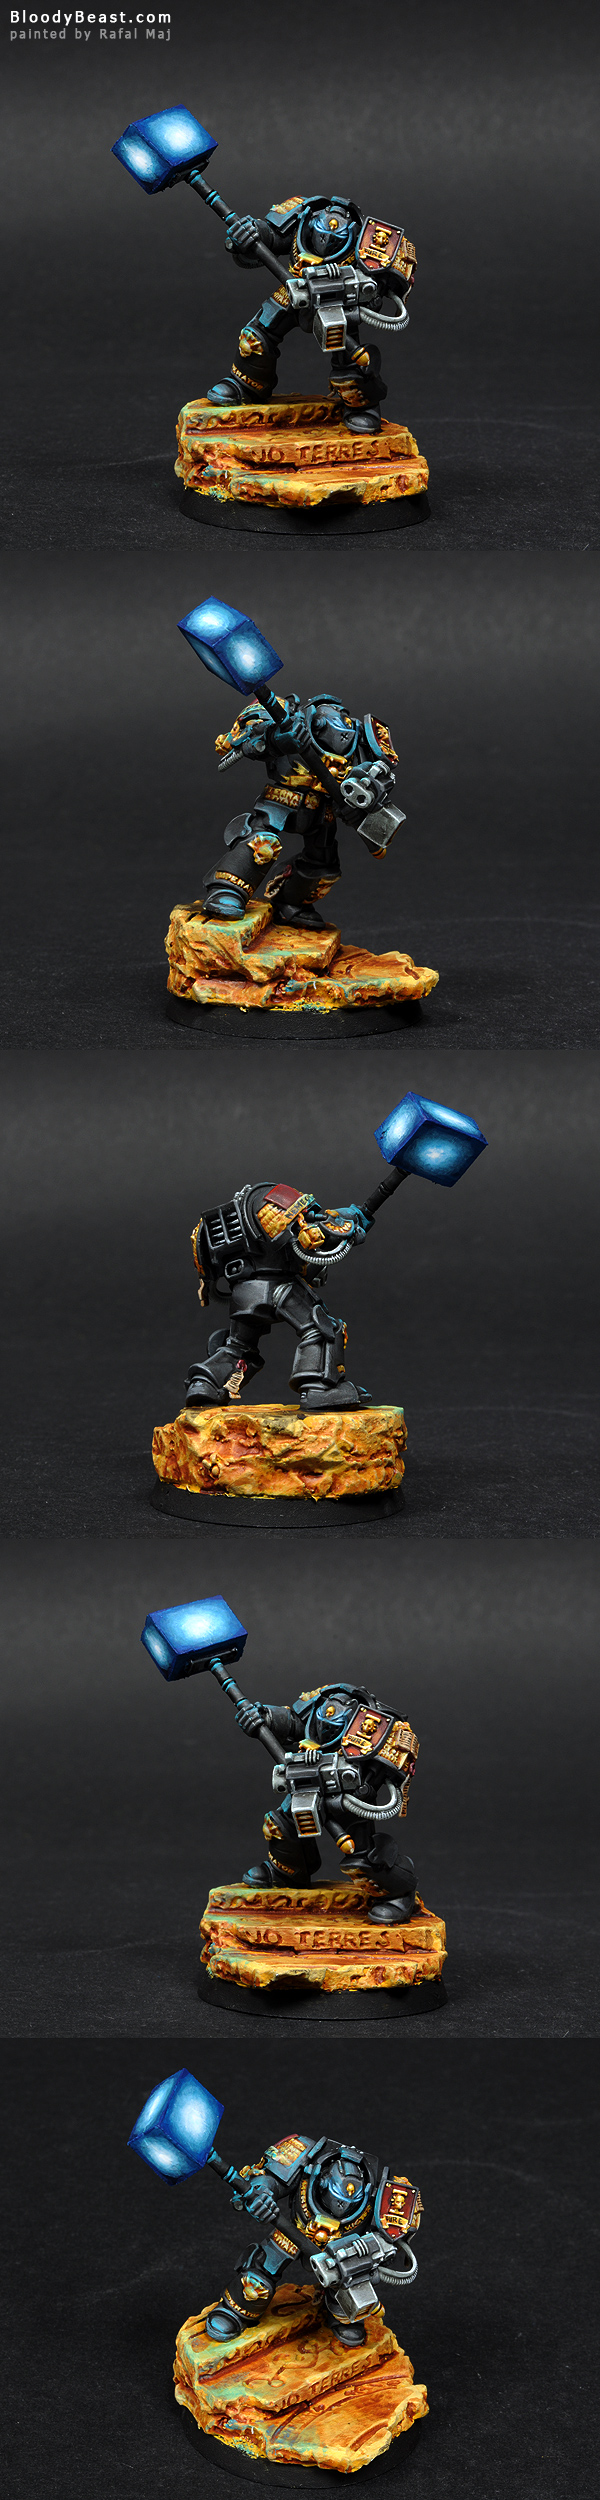 Grey Knight with Nemesis Daemon Hammer painted by Rafal Maj (BloodyBeast.com)